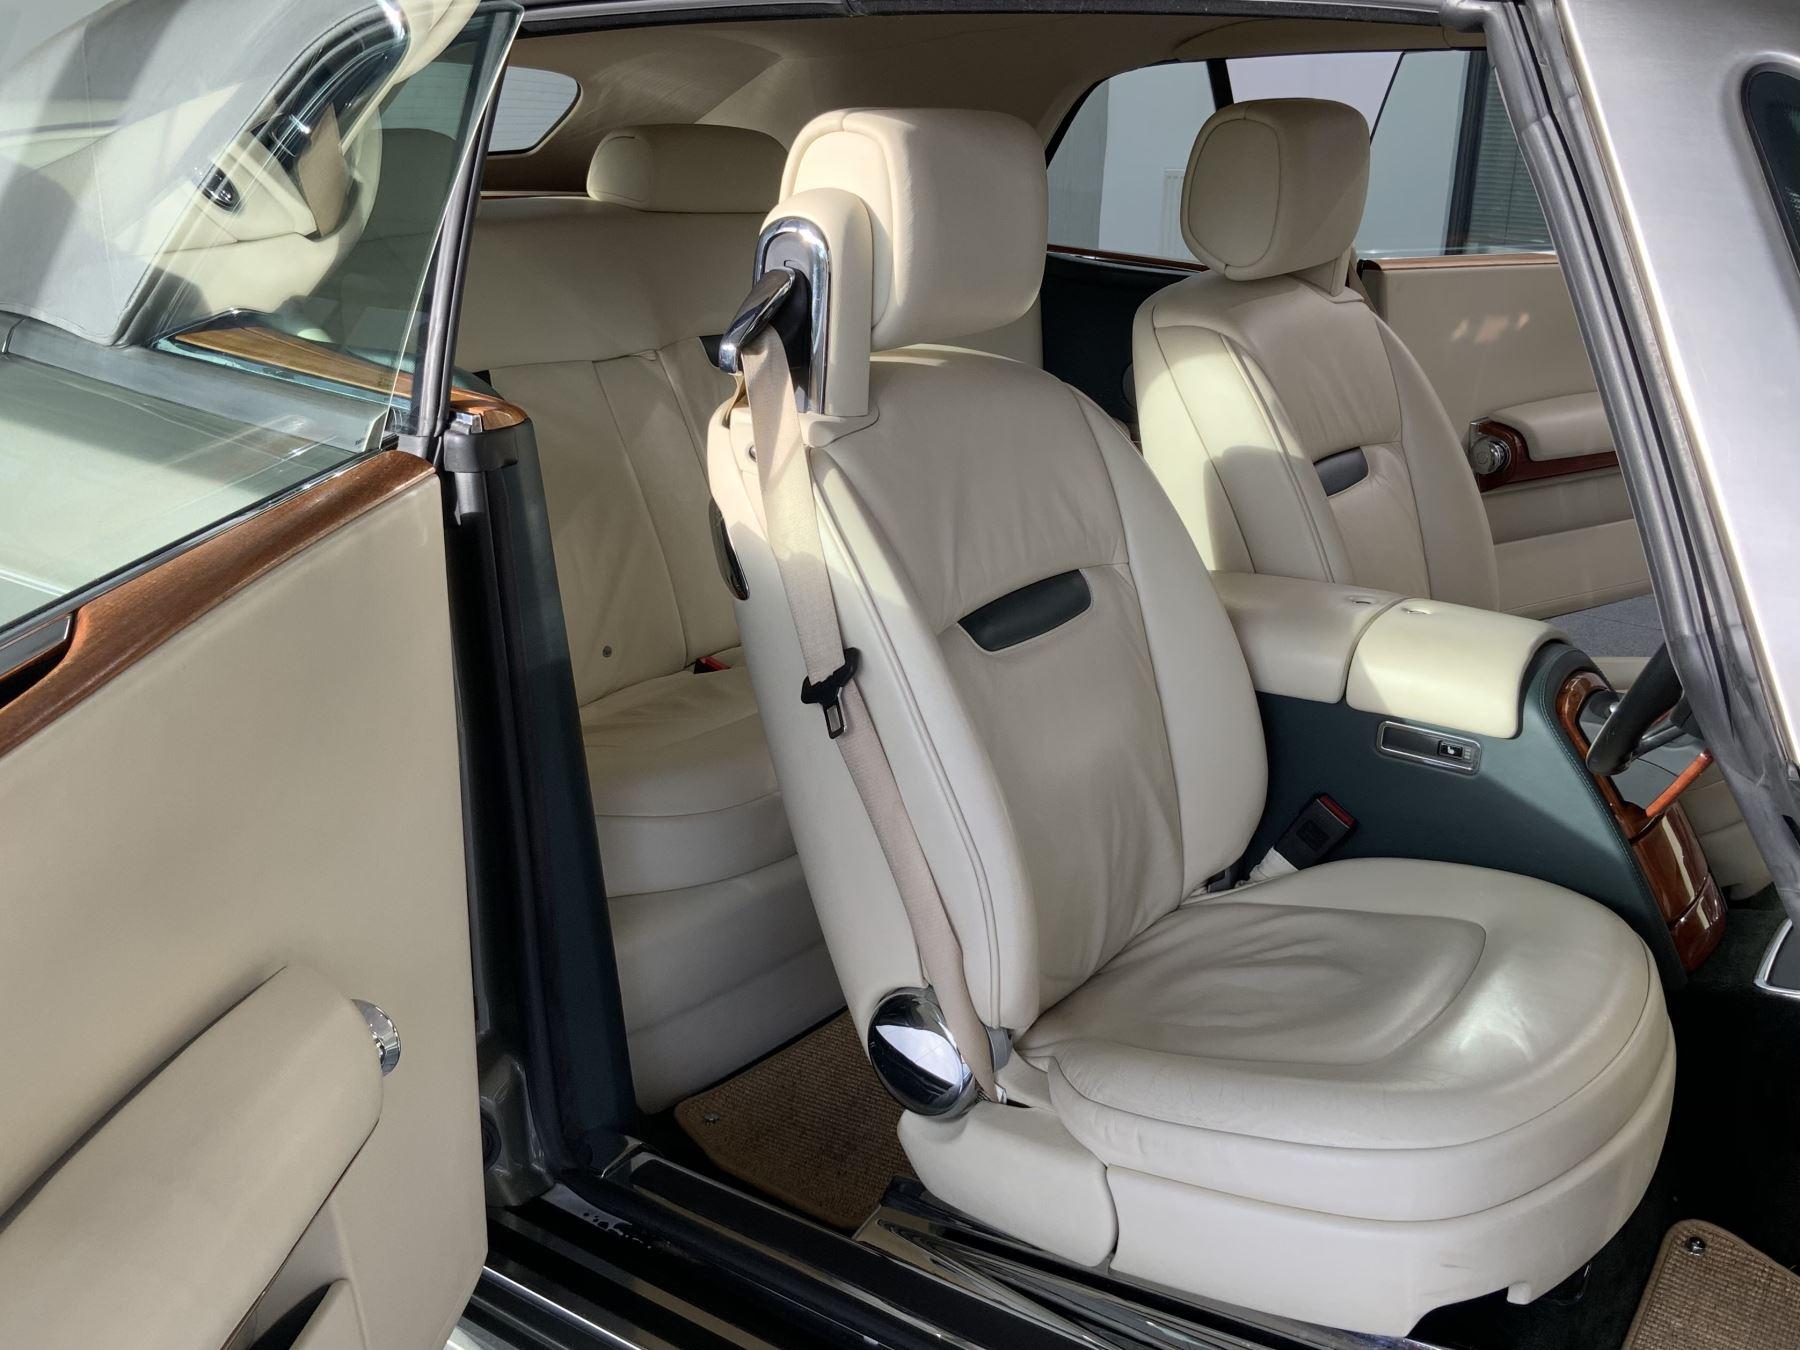 Rolls-Royce Phantom Drophead Coupe 2dr Auto image 34